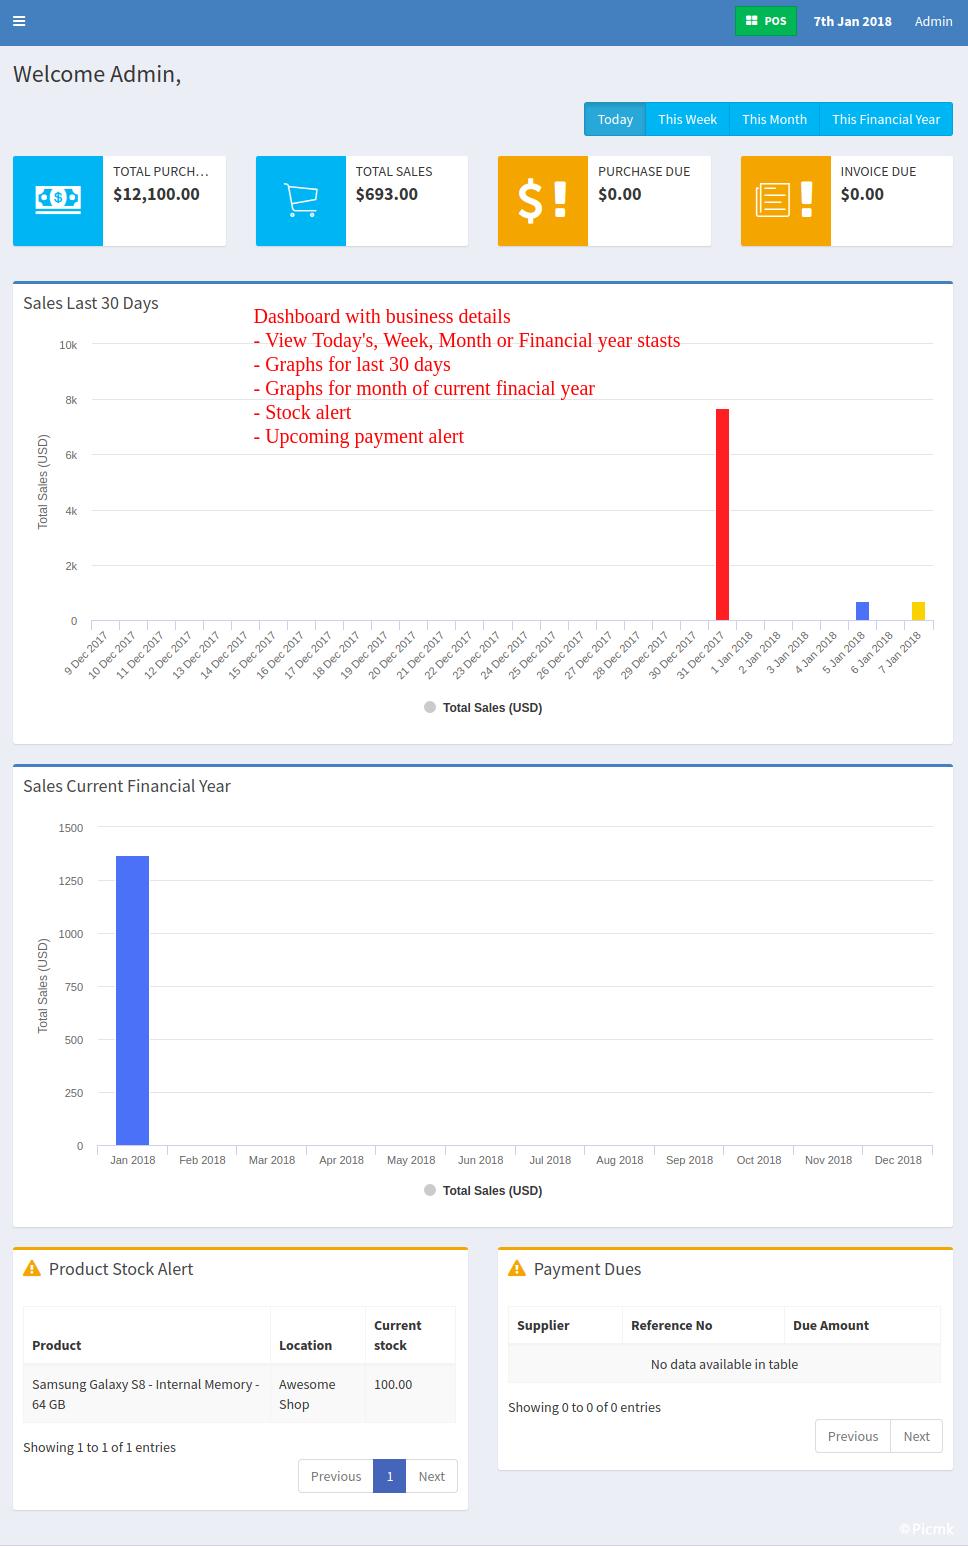 UltimatePOS V4.3 - PHP銷售終端 PHP企業資源計劃係統(ERP) 庫存管理 發票管理 零售係統 開心版插圖1